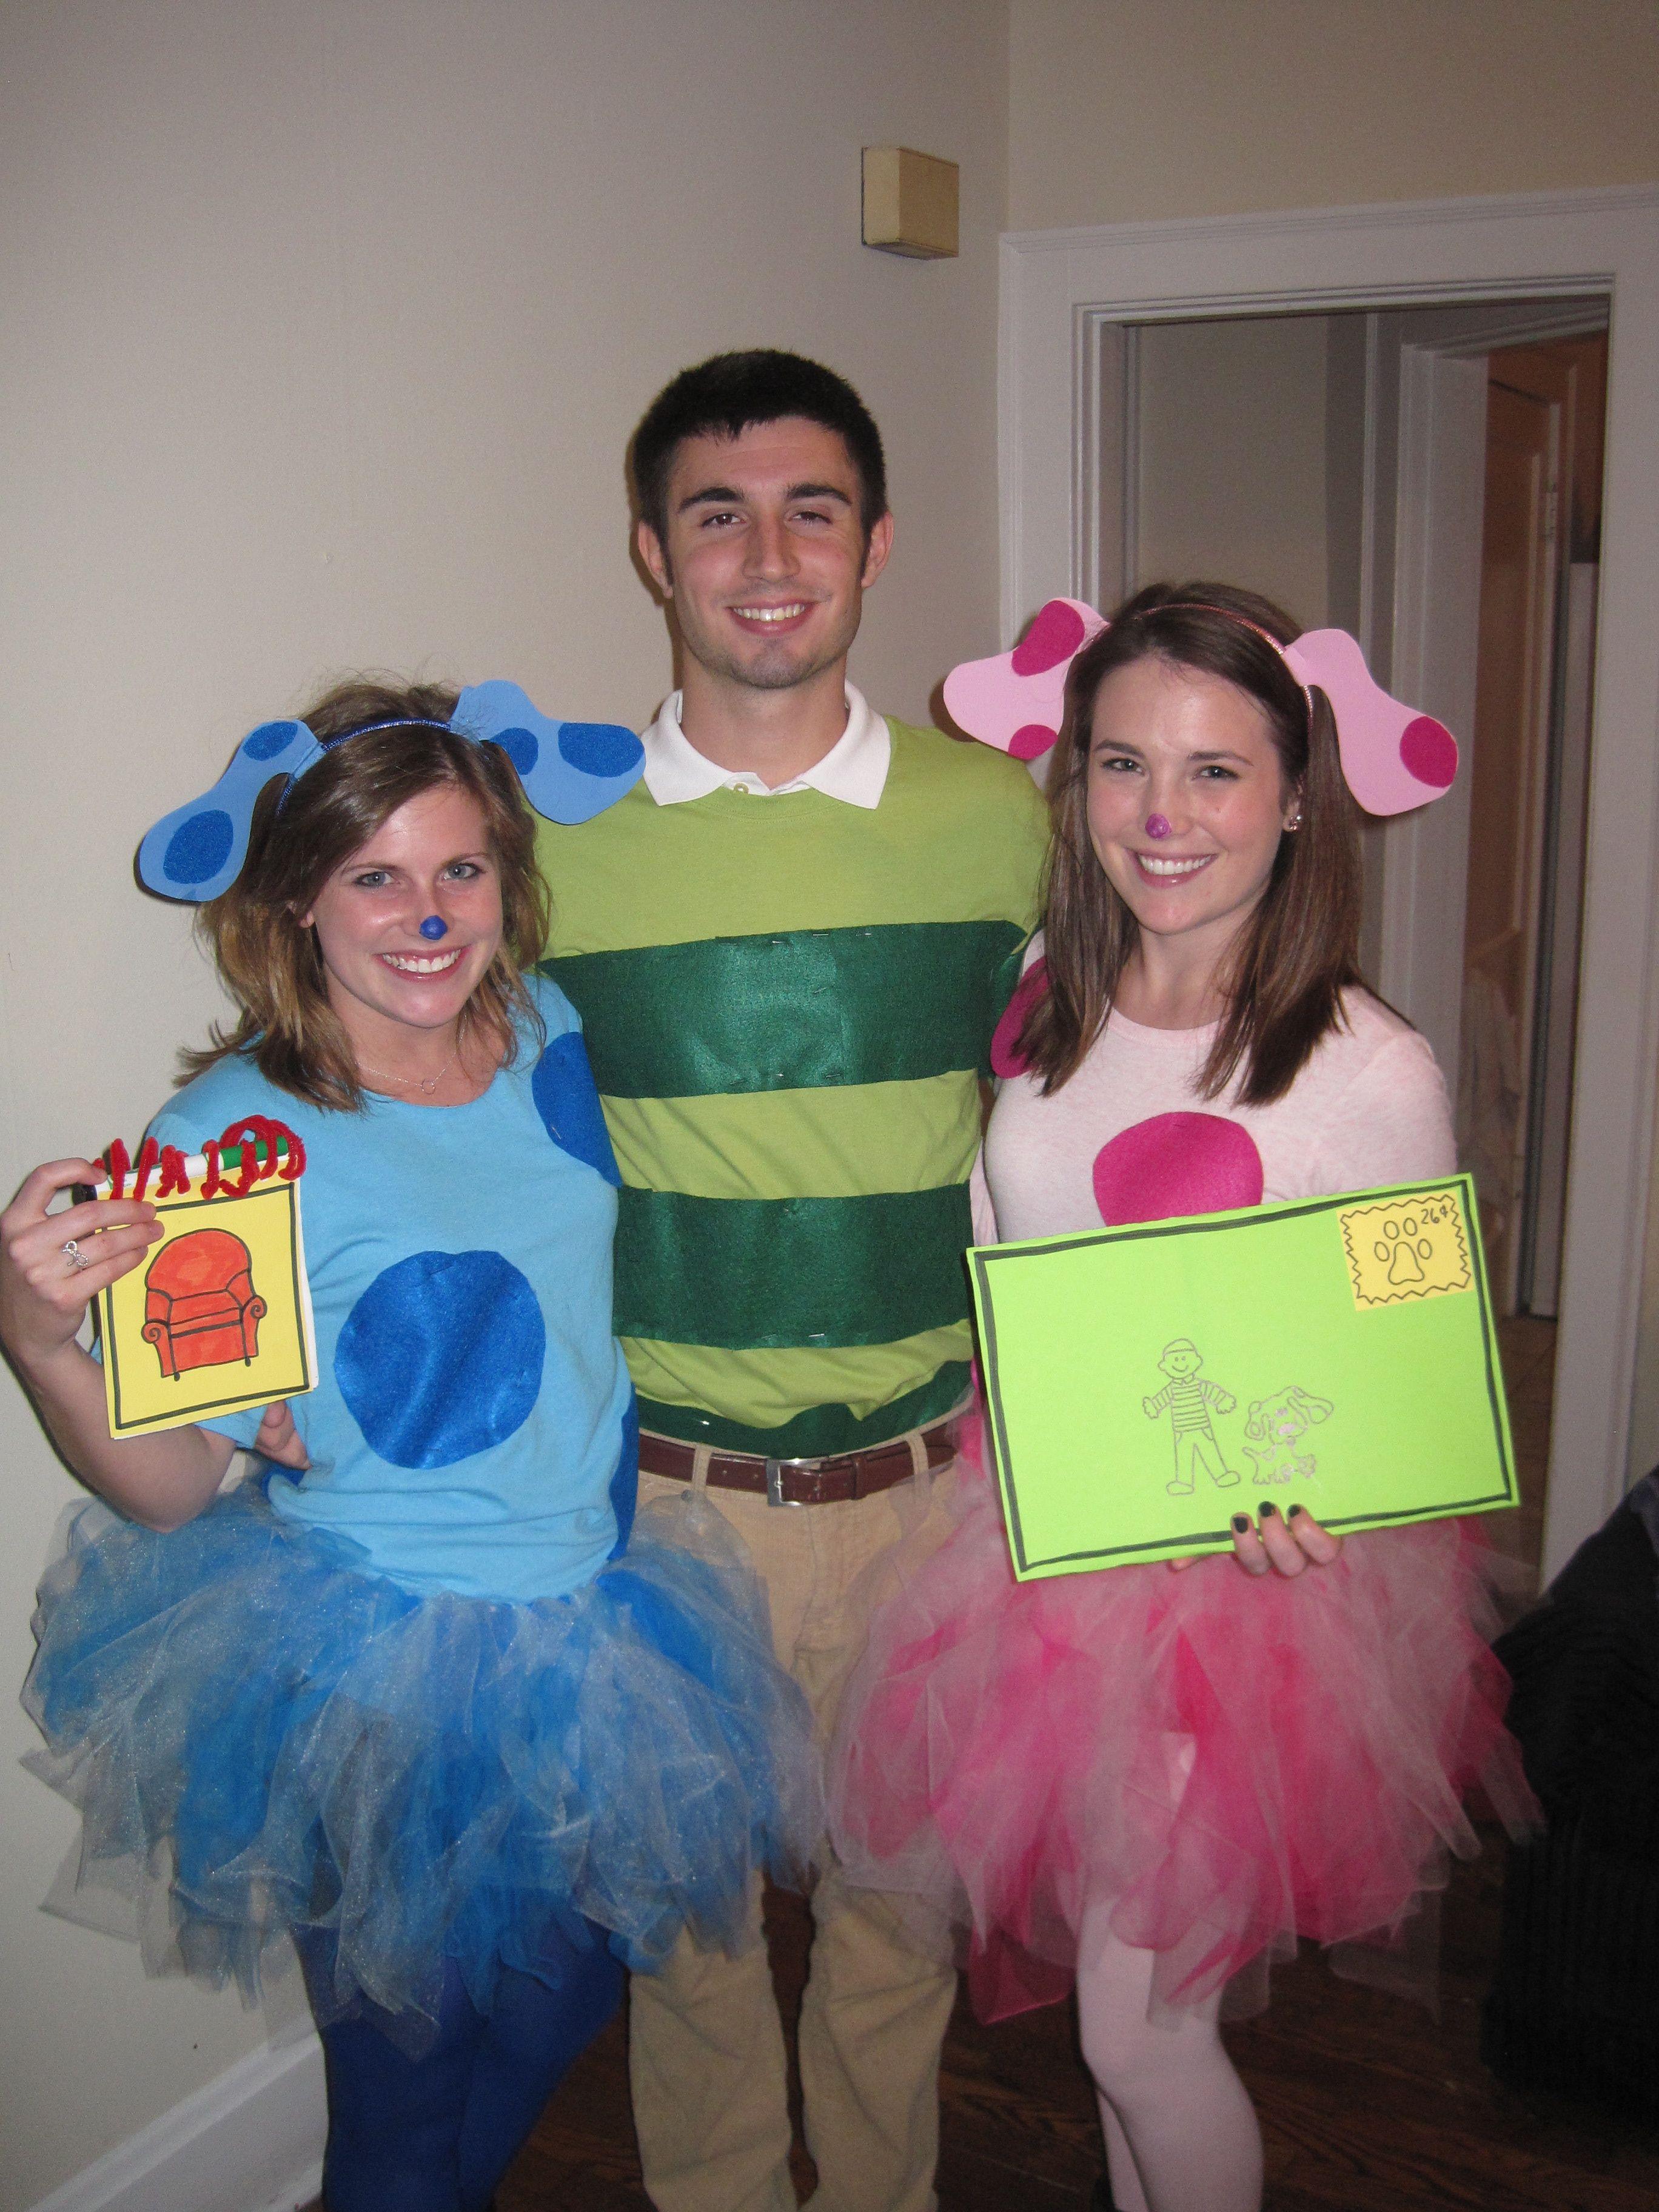 Blue Clues Halloween : clues, halloween, Collins, Halloween, Blues, Clues, Costume,, Zombie, Costumes,, Homemade, Costumes